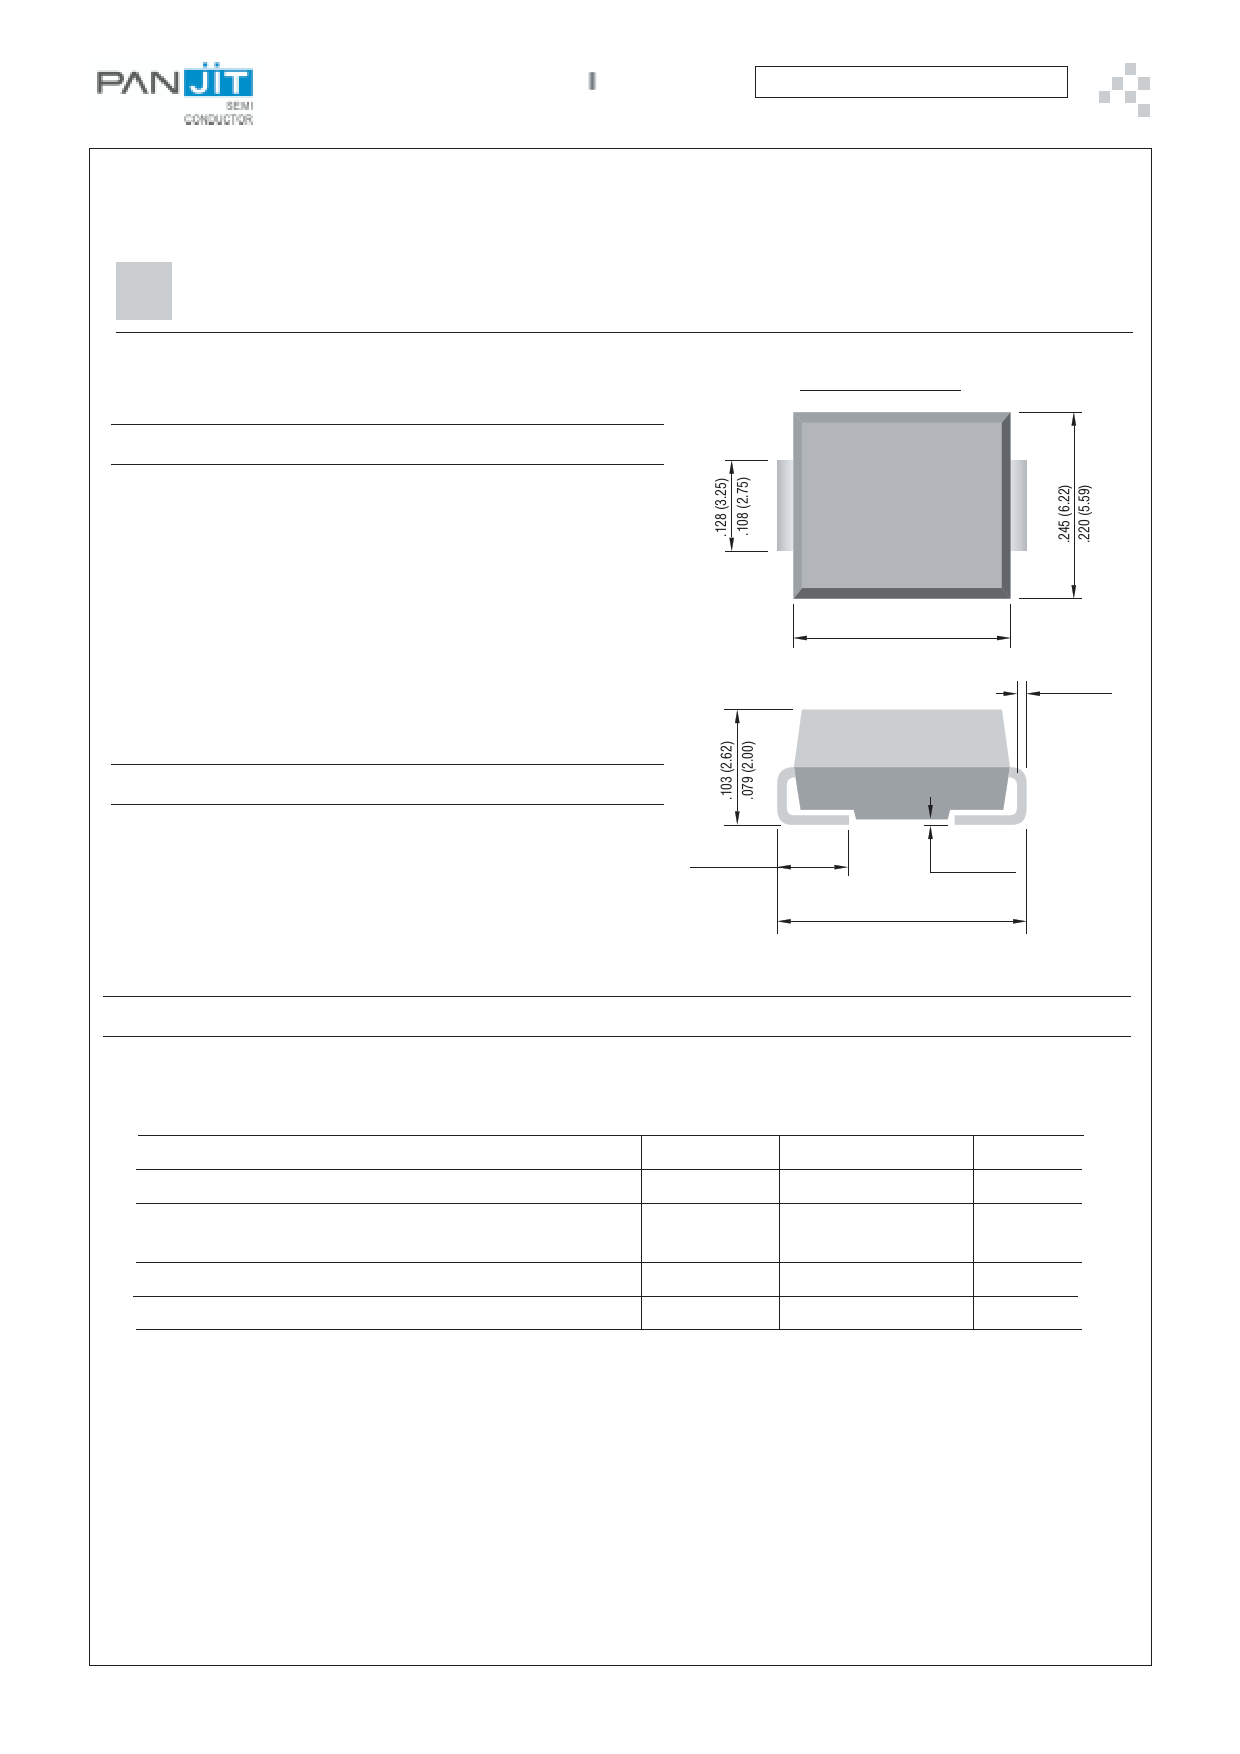 3.0SMCJ100CA دیتاشیت PDF